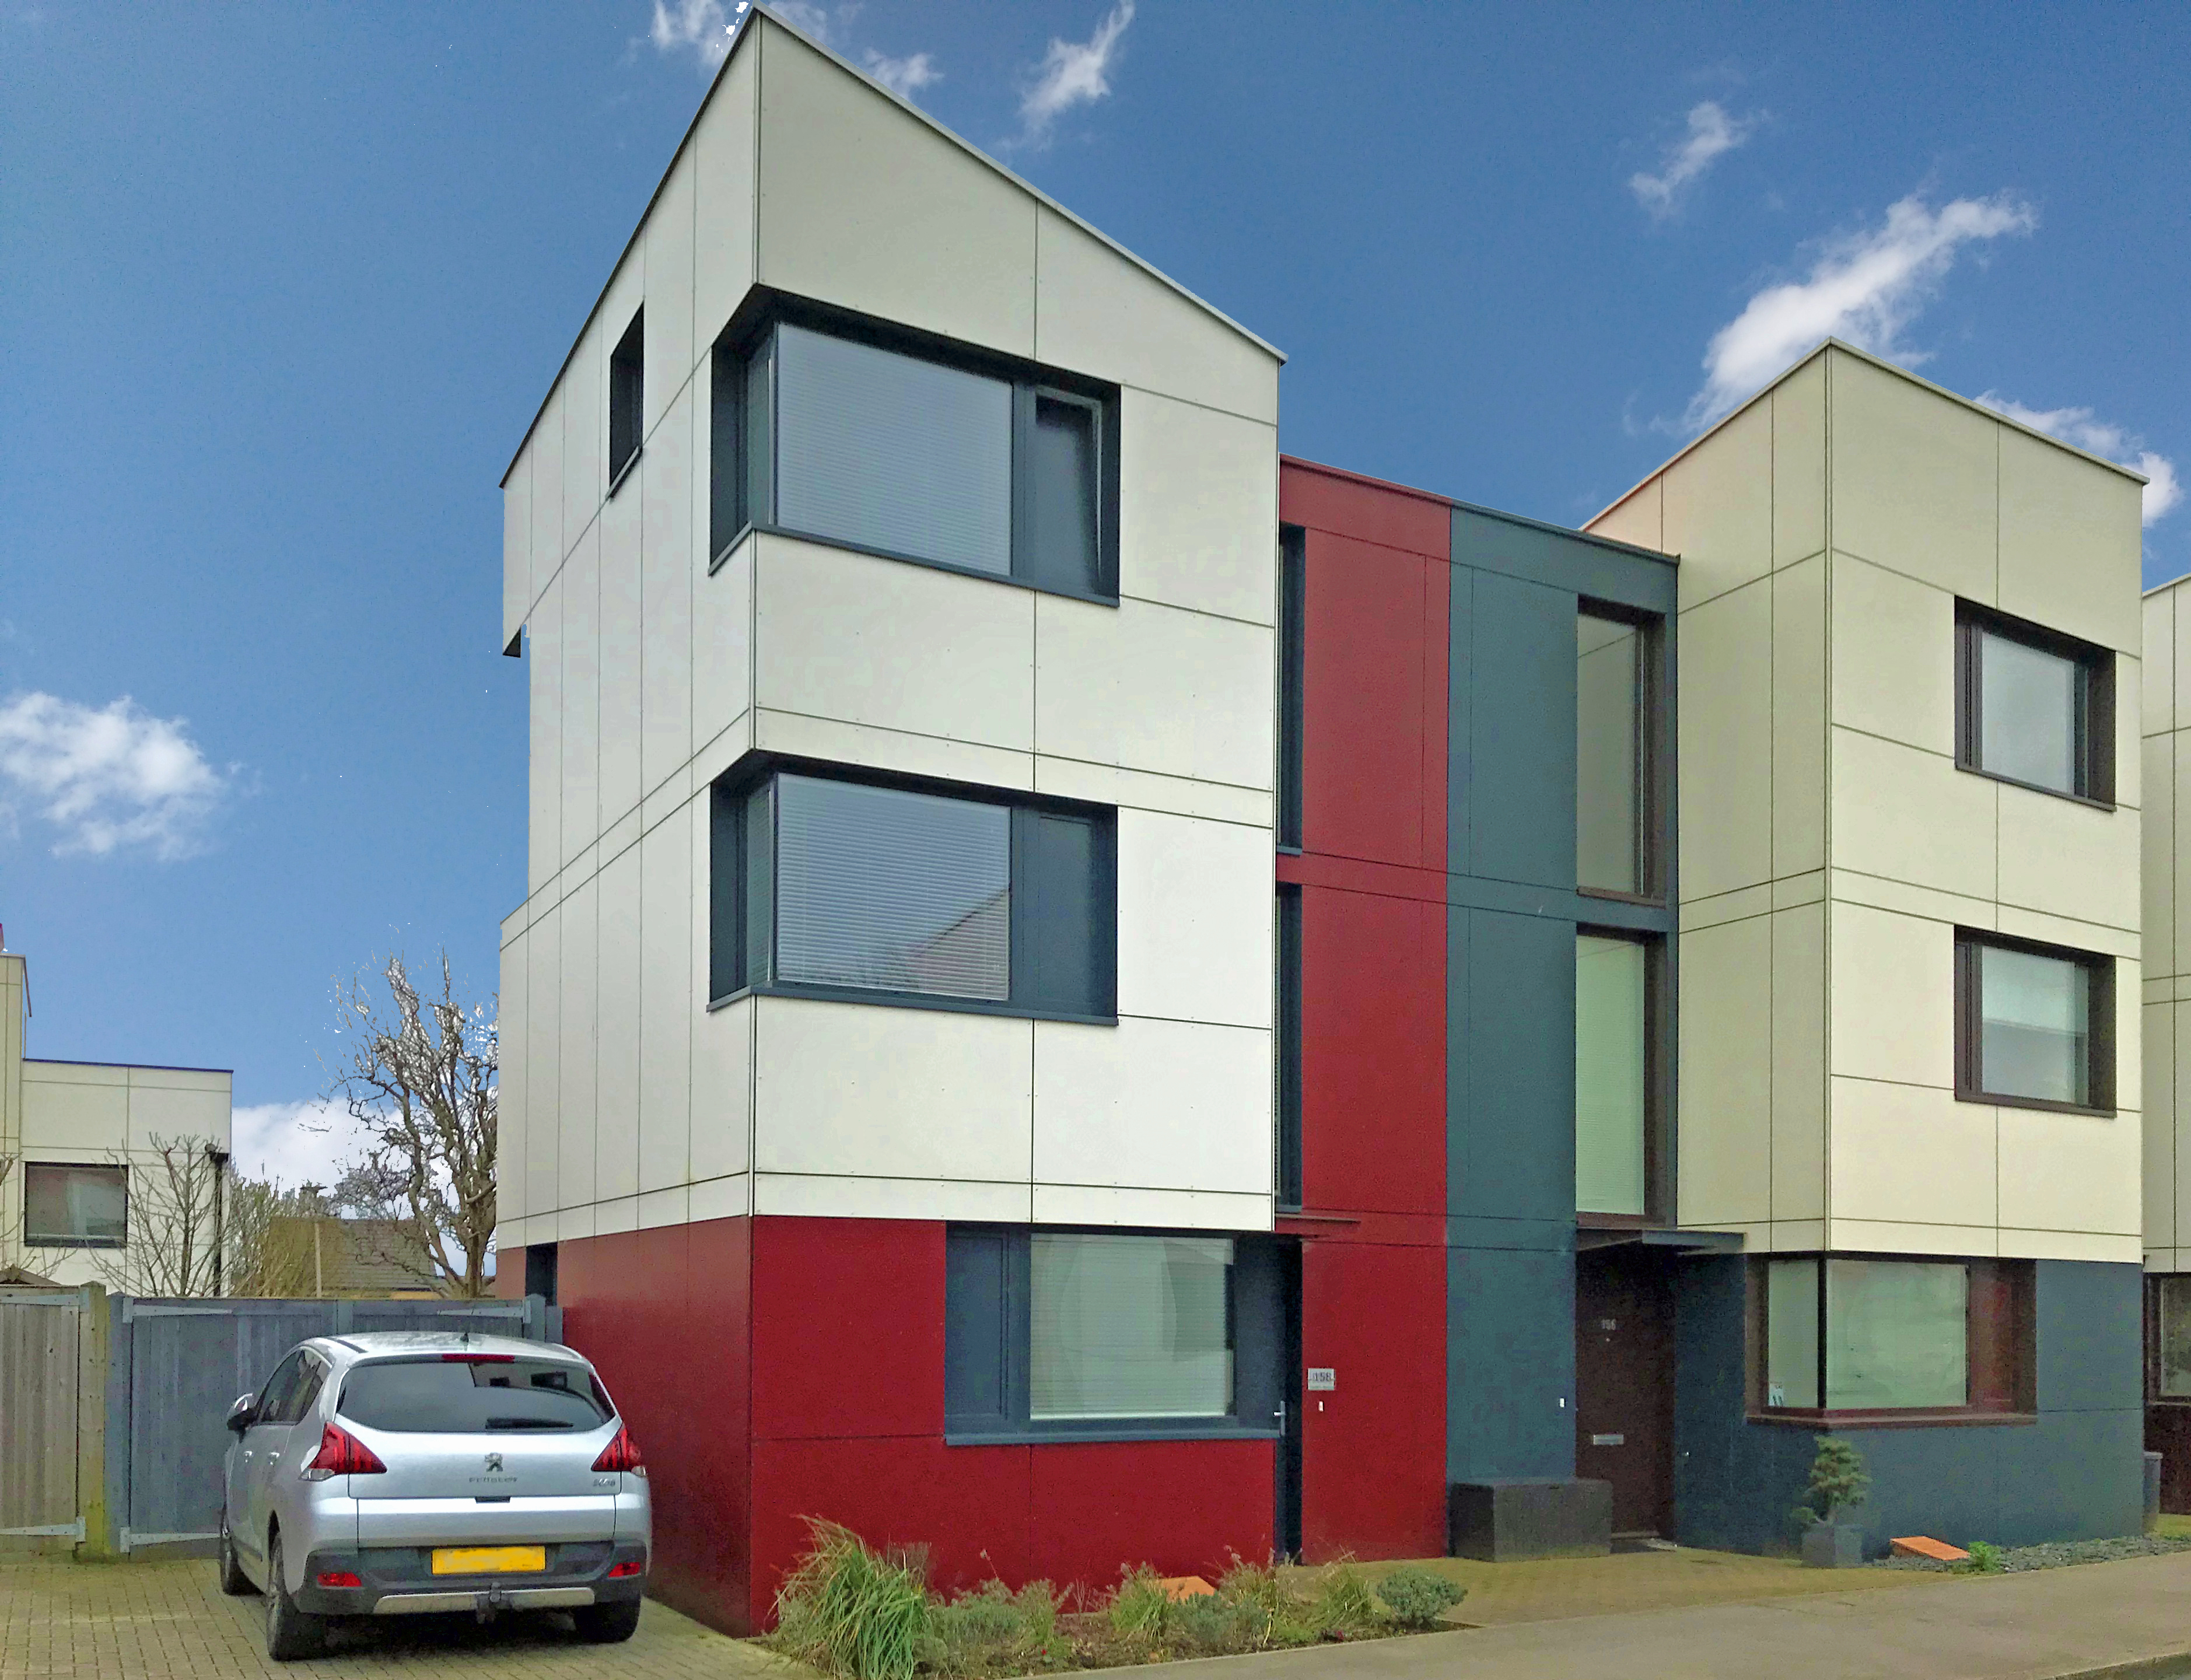 Holden Avenue, Milton Keynes, Buckinghamshire Image